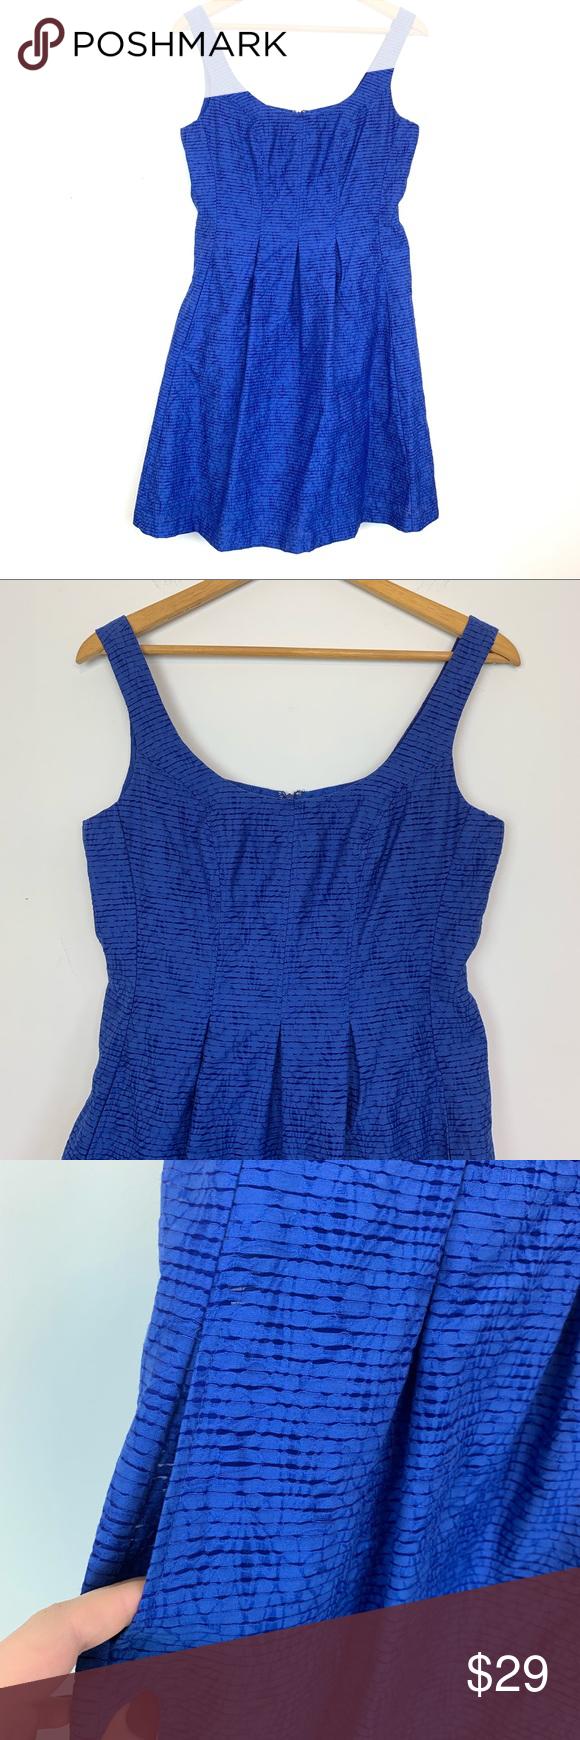 80b59ef11b4 Nine West Dress Sz 8 Blue Sleeveless Summer Spring Nine West Women s Dress  Size 8 Blue